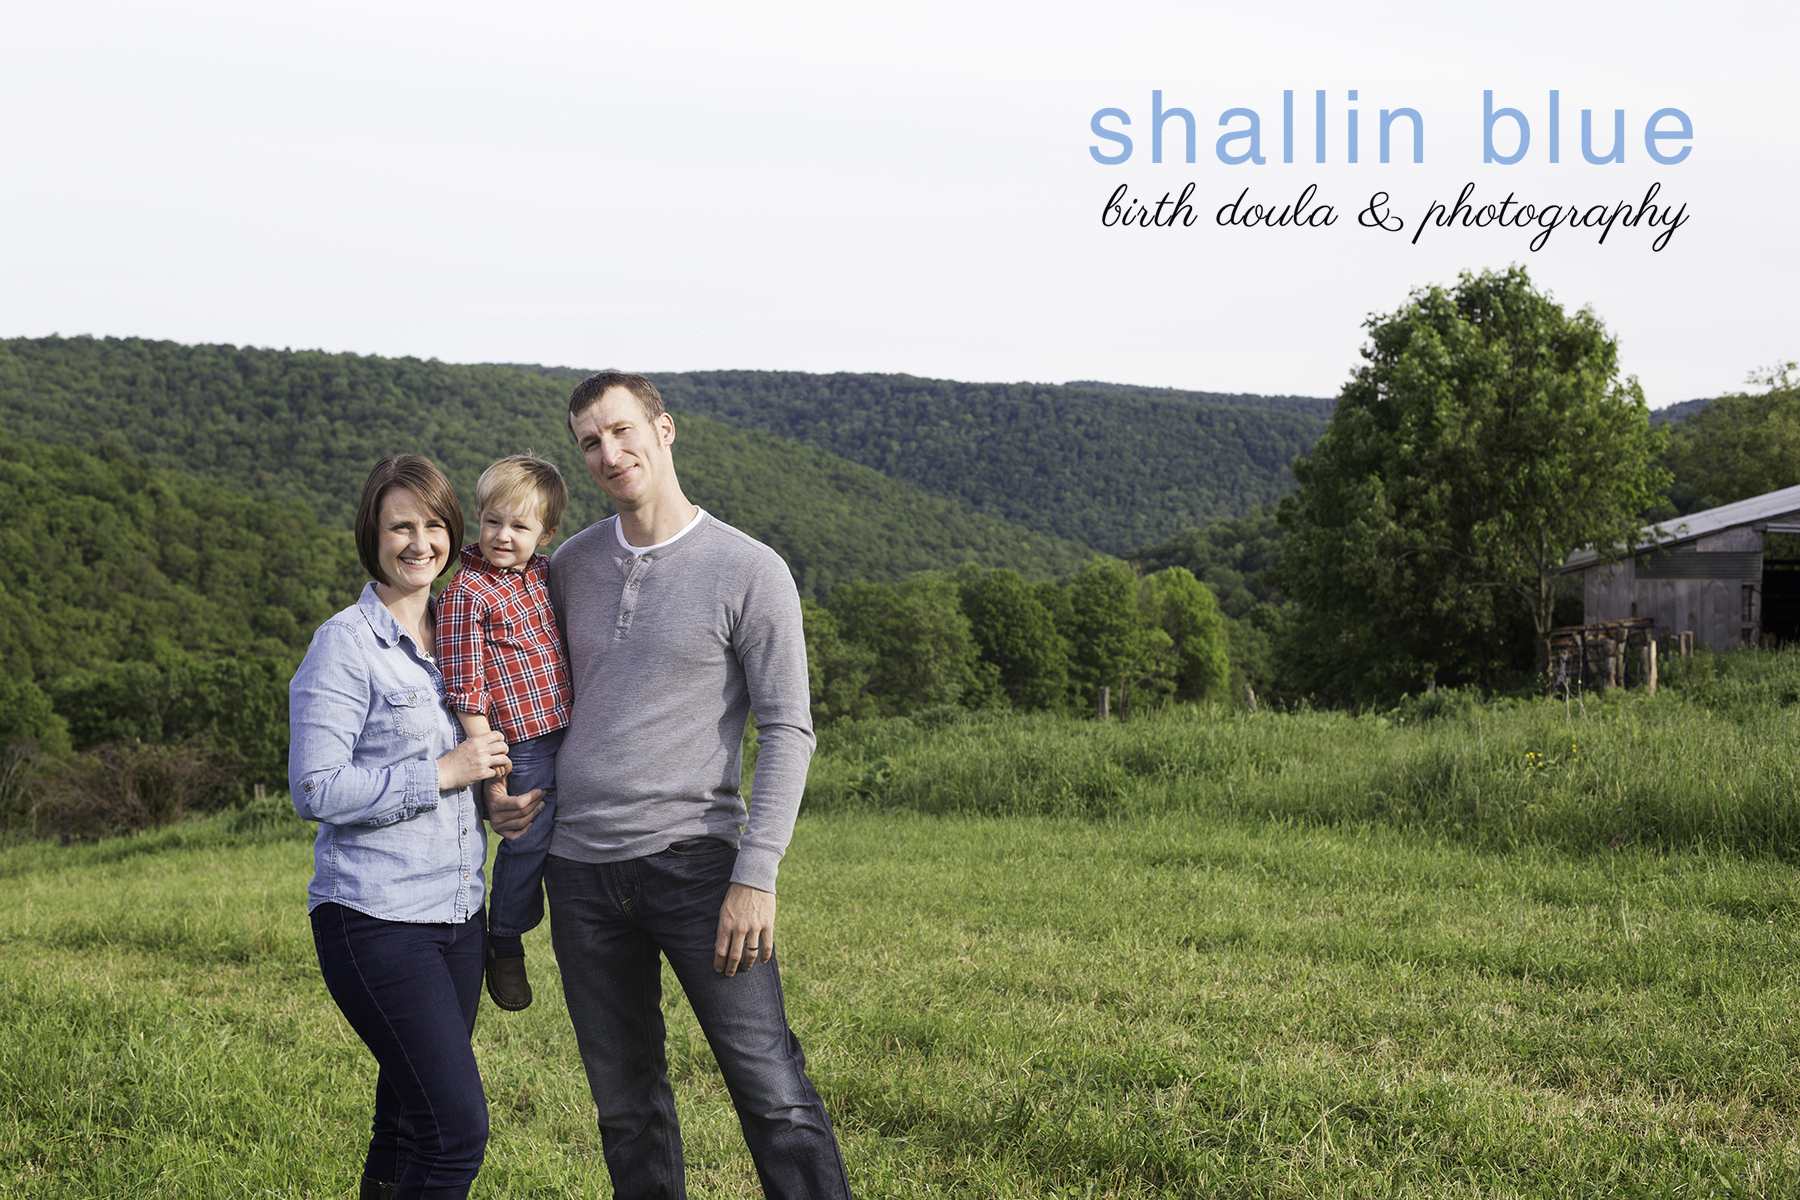 familyphotographykailua.jpg